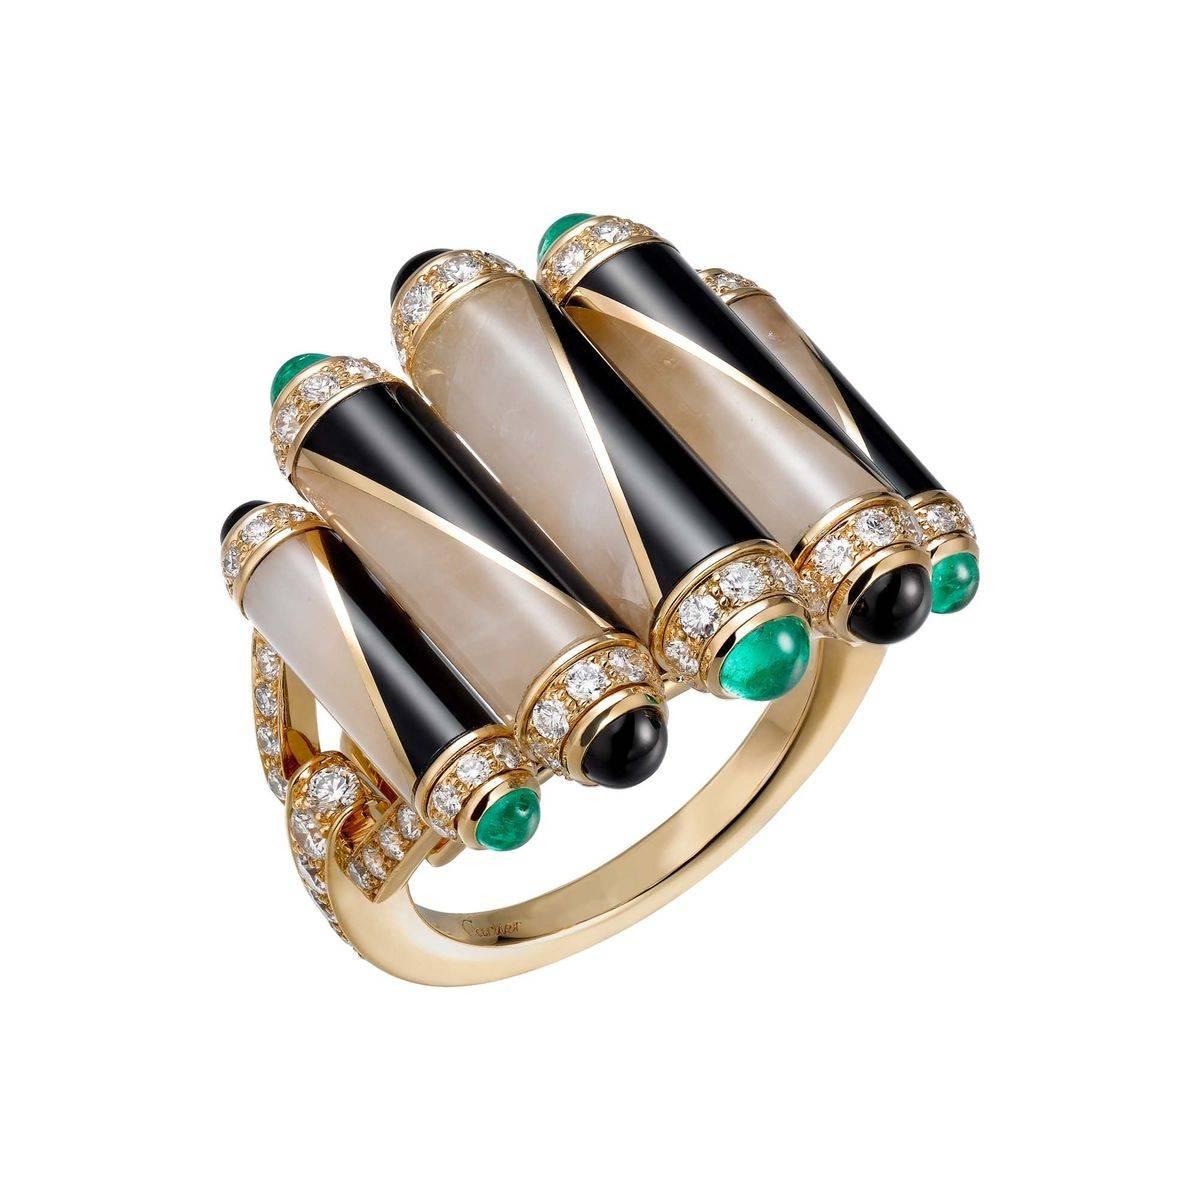 Art deco jewelry-680043612460964891